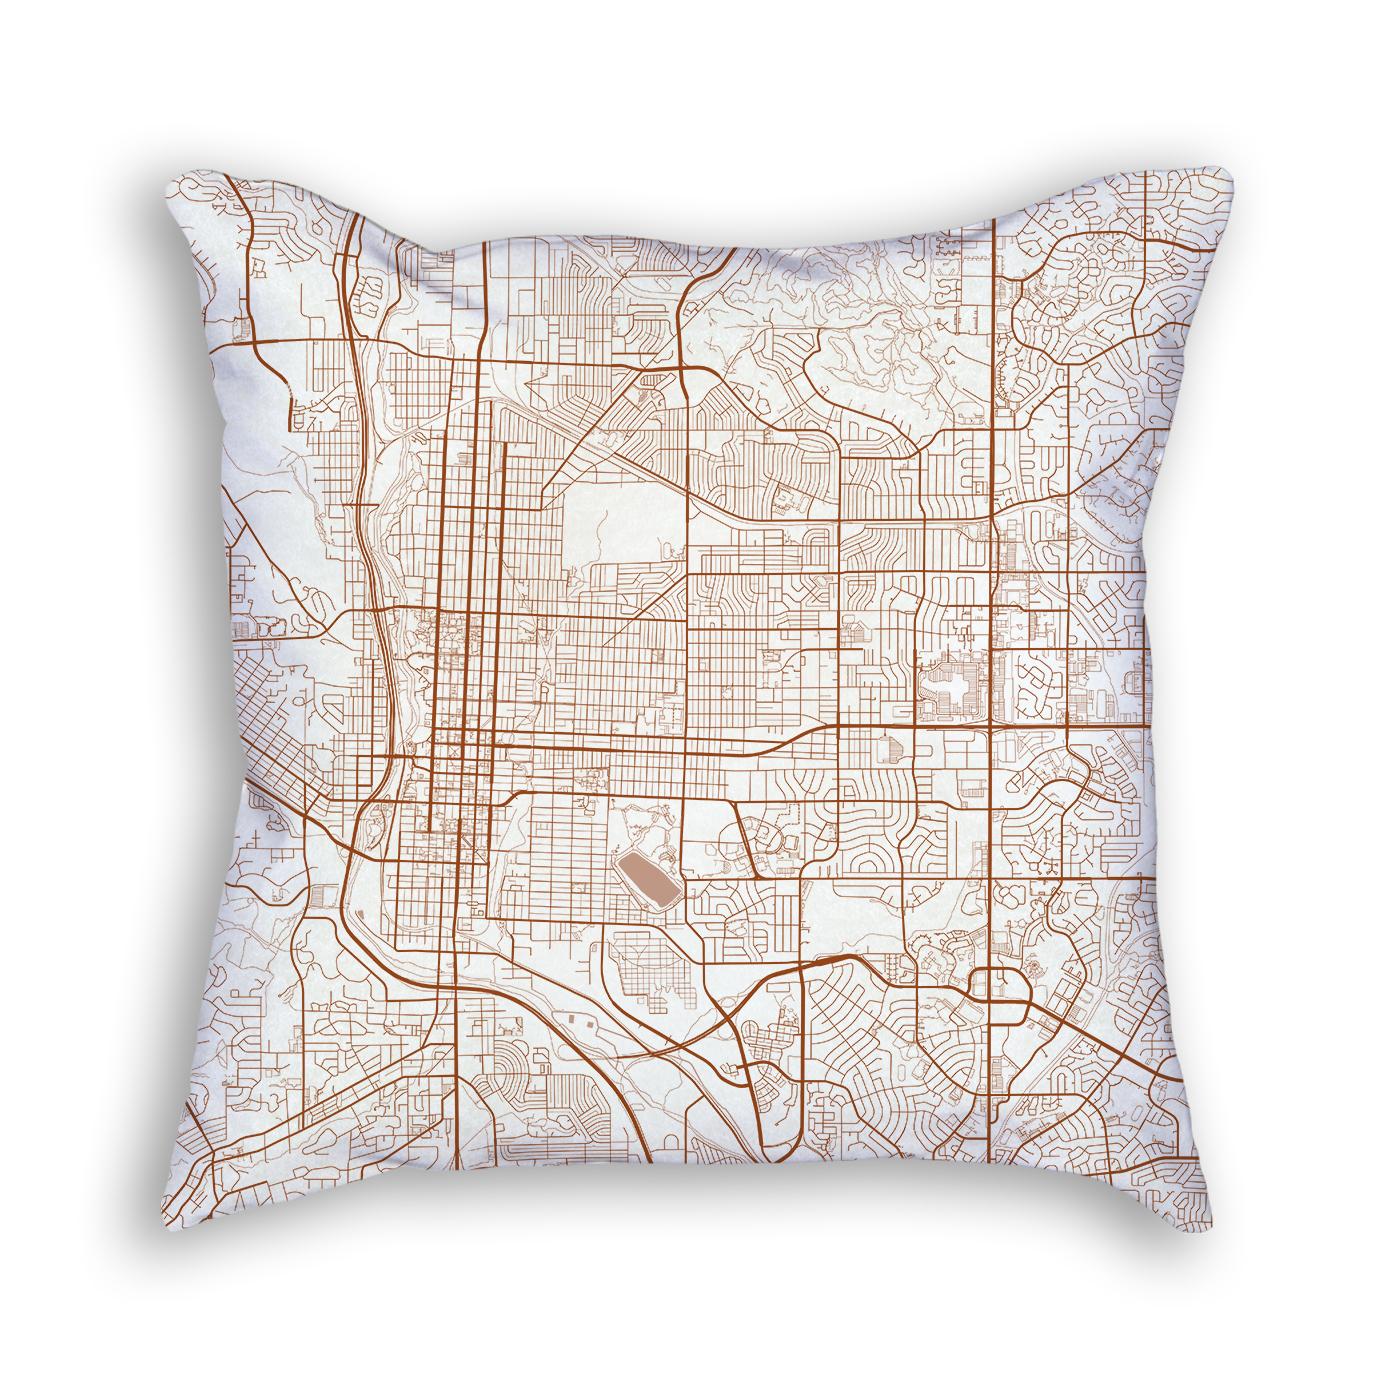 Colorado Springs City Map Art Decorative Throw Pillow